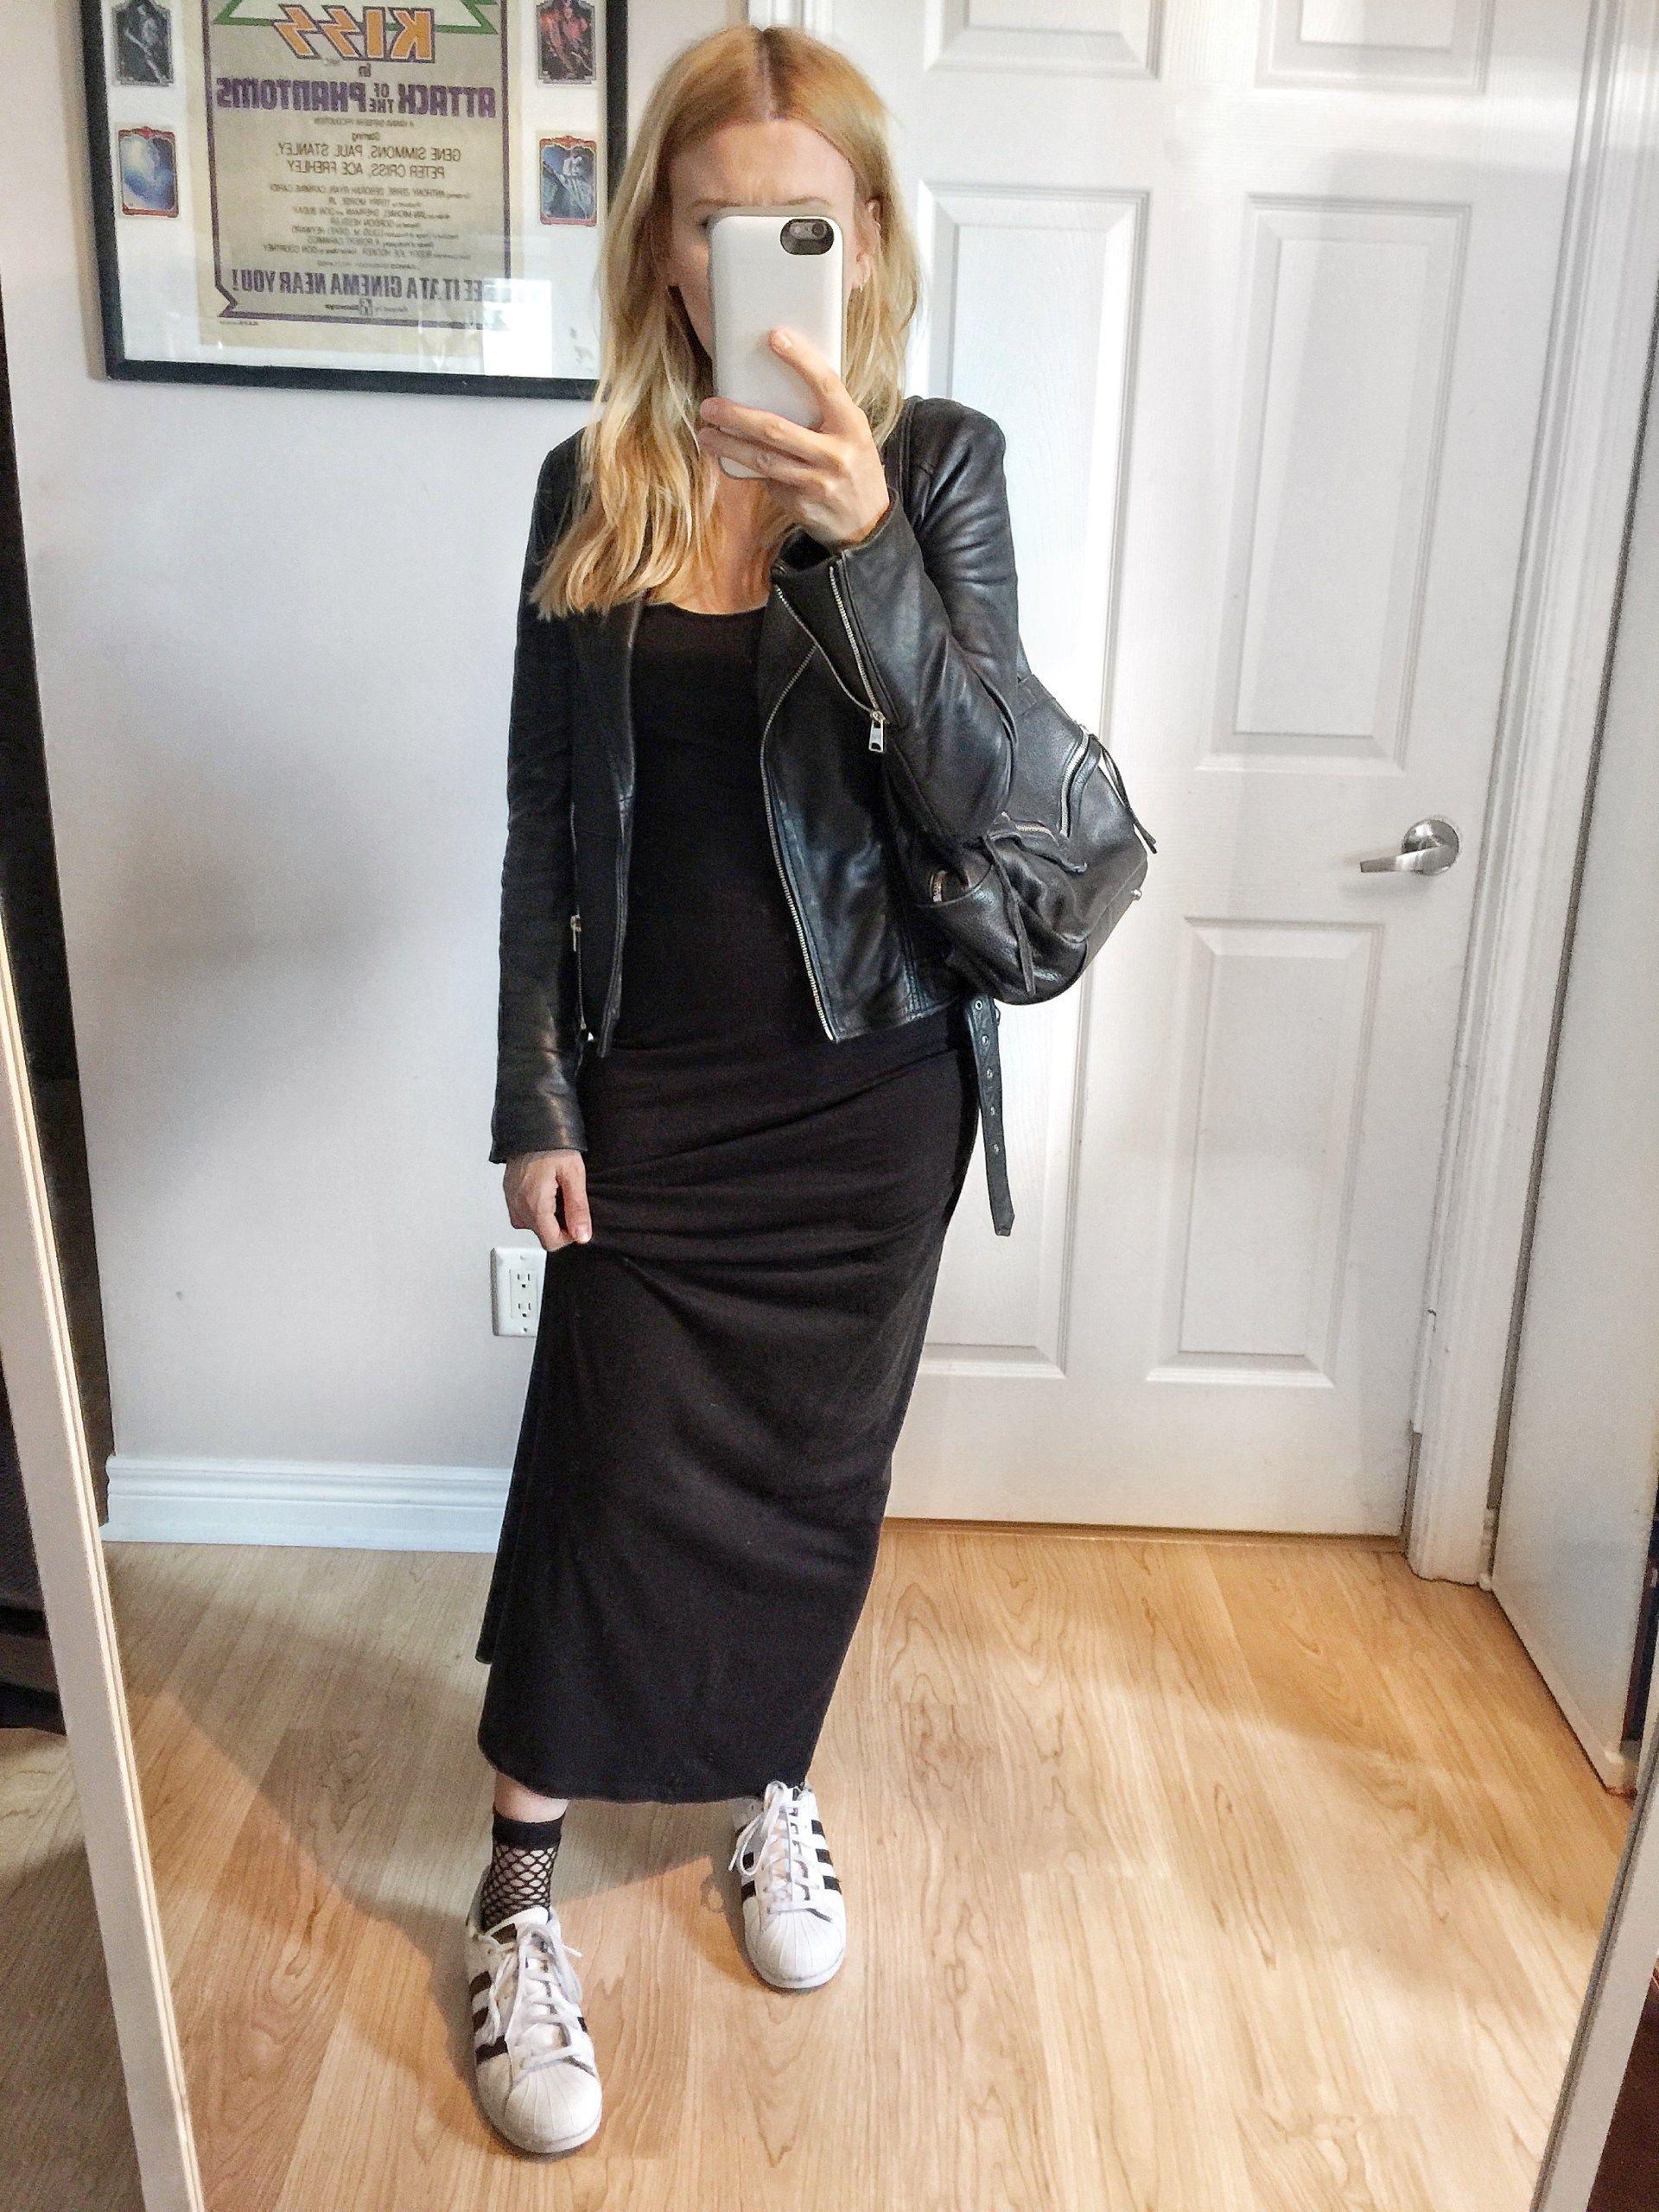 Black Maxi dress+black leather jacket+black fishnet socks+white  sneakers+black backpack. Fall Casual Outfit 2017 68e8943f34